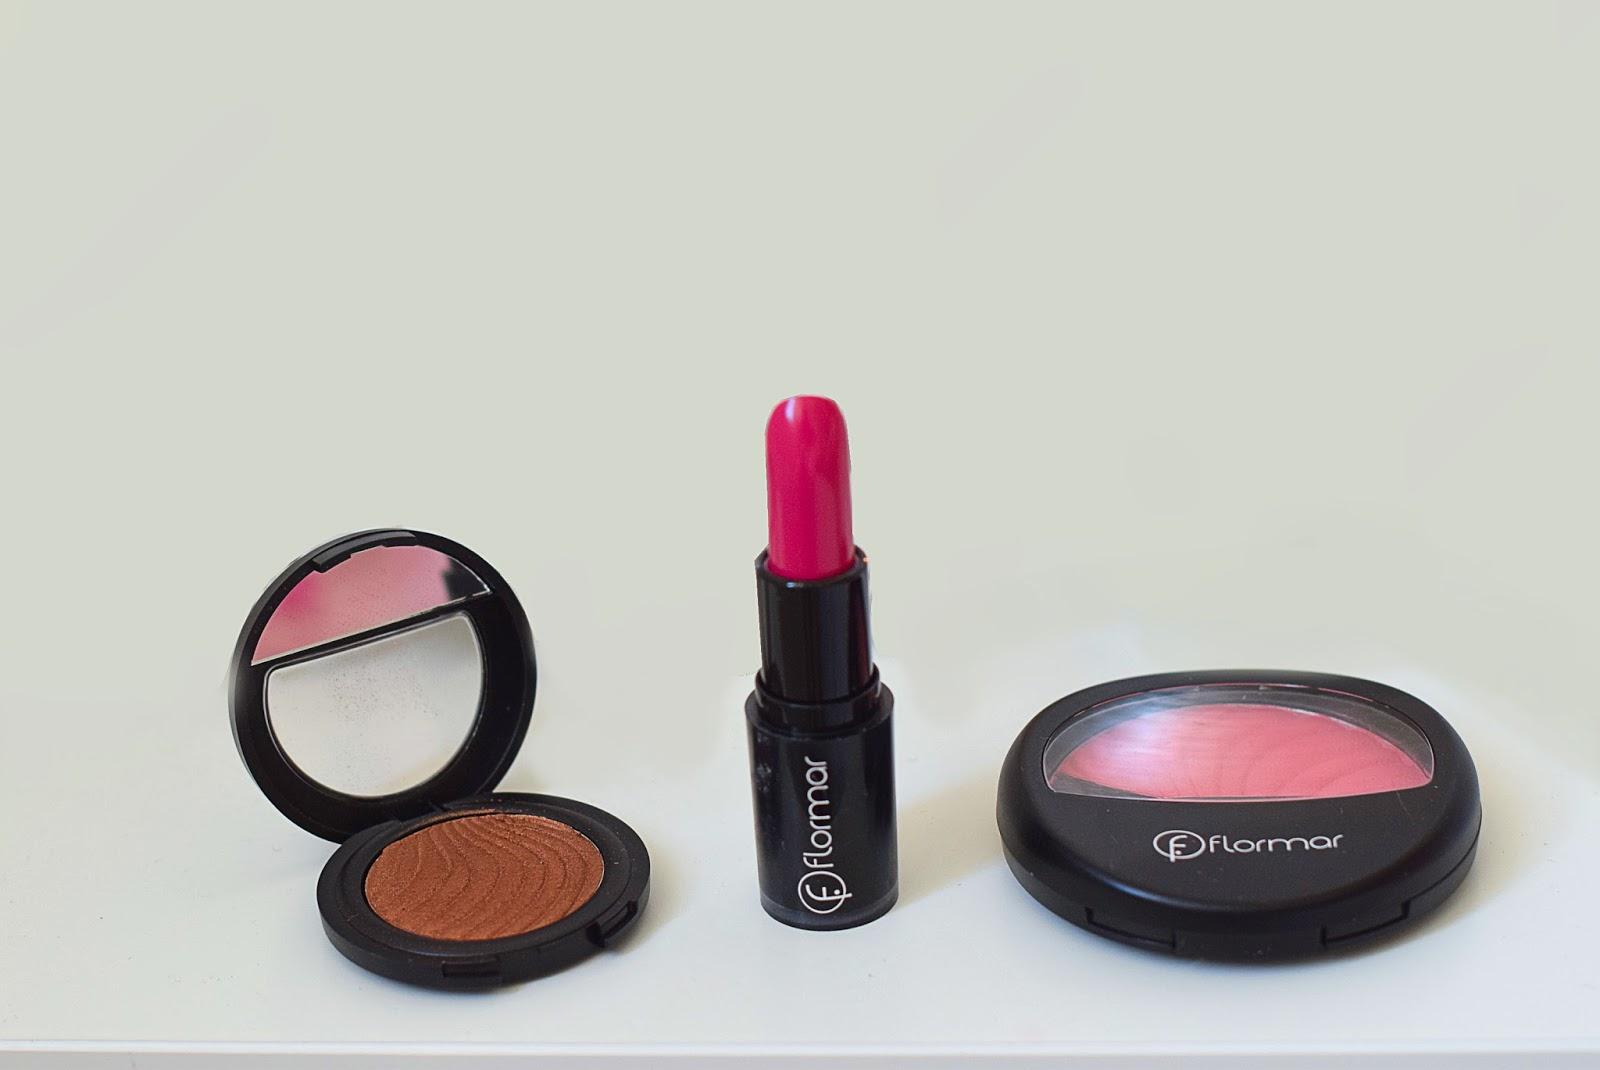 nery hdez, maquillaje, flormar,make up, yrb fashion